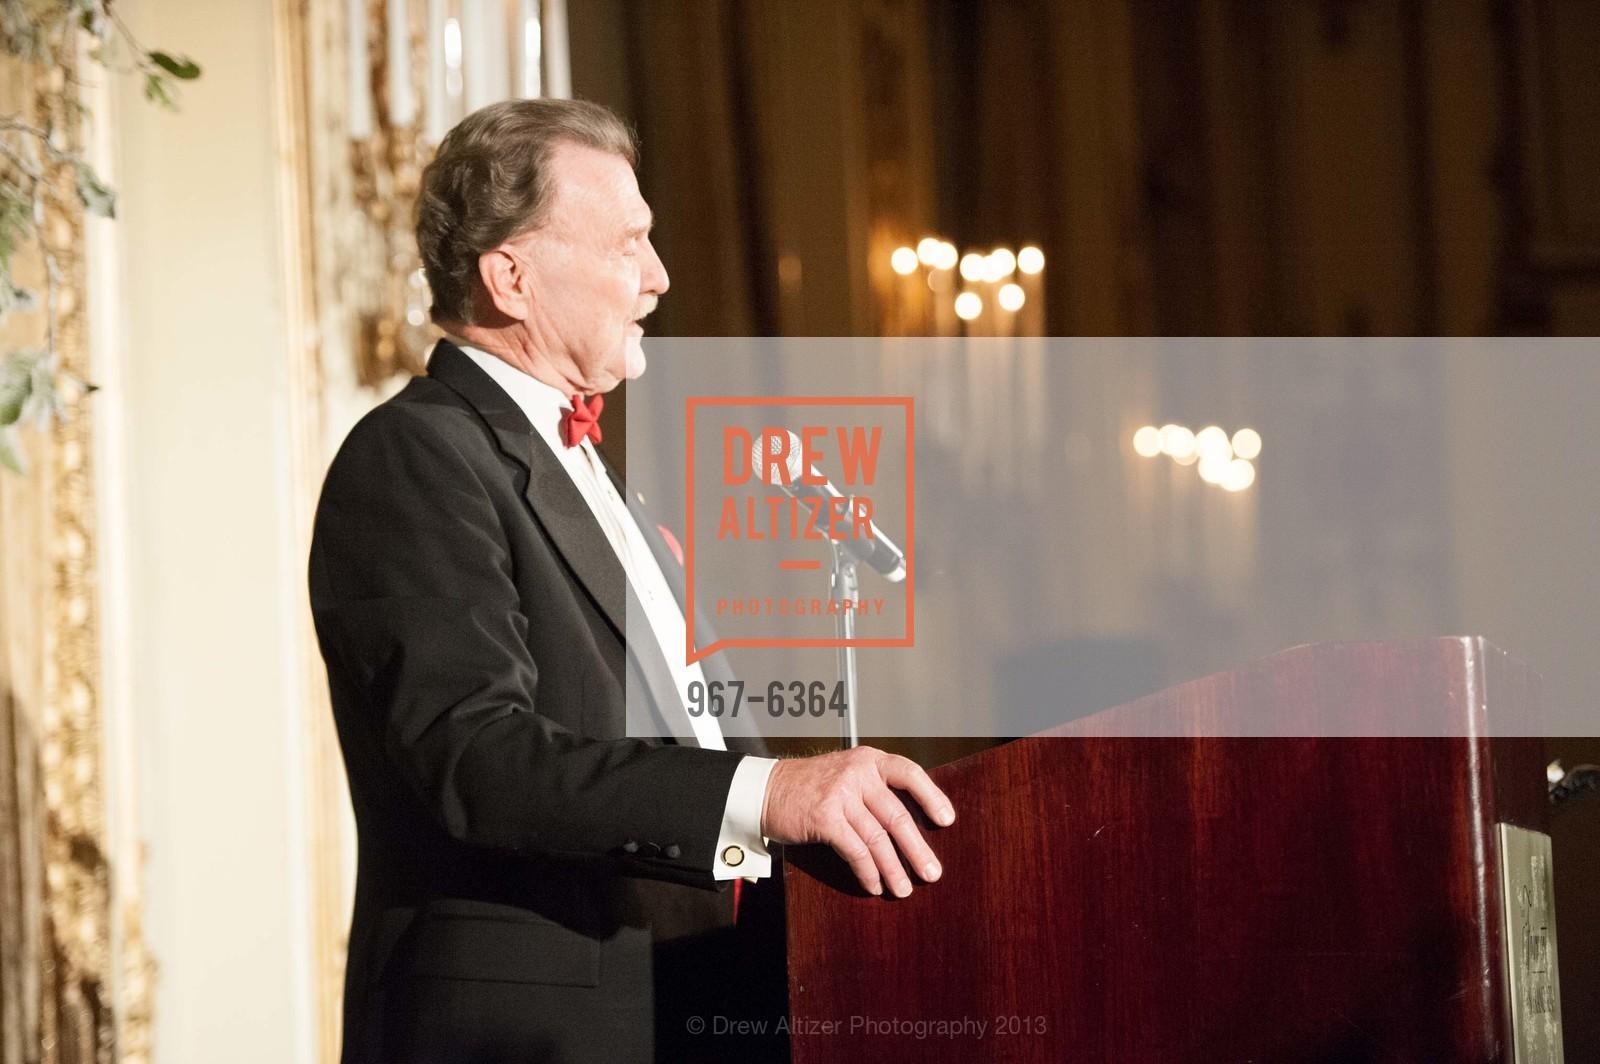 Hugh Vincent, 25th Anniversary Holiday HOB NOB ON THE HILL, US, December 6th, 2013